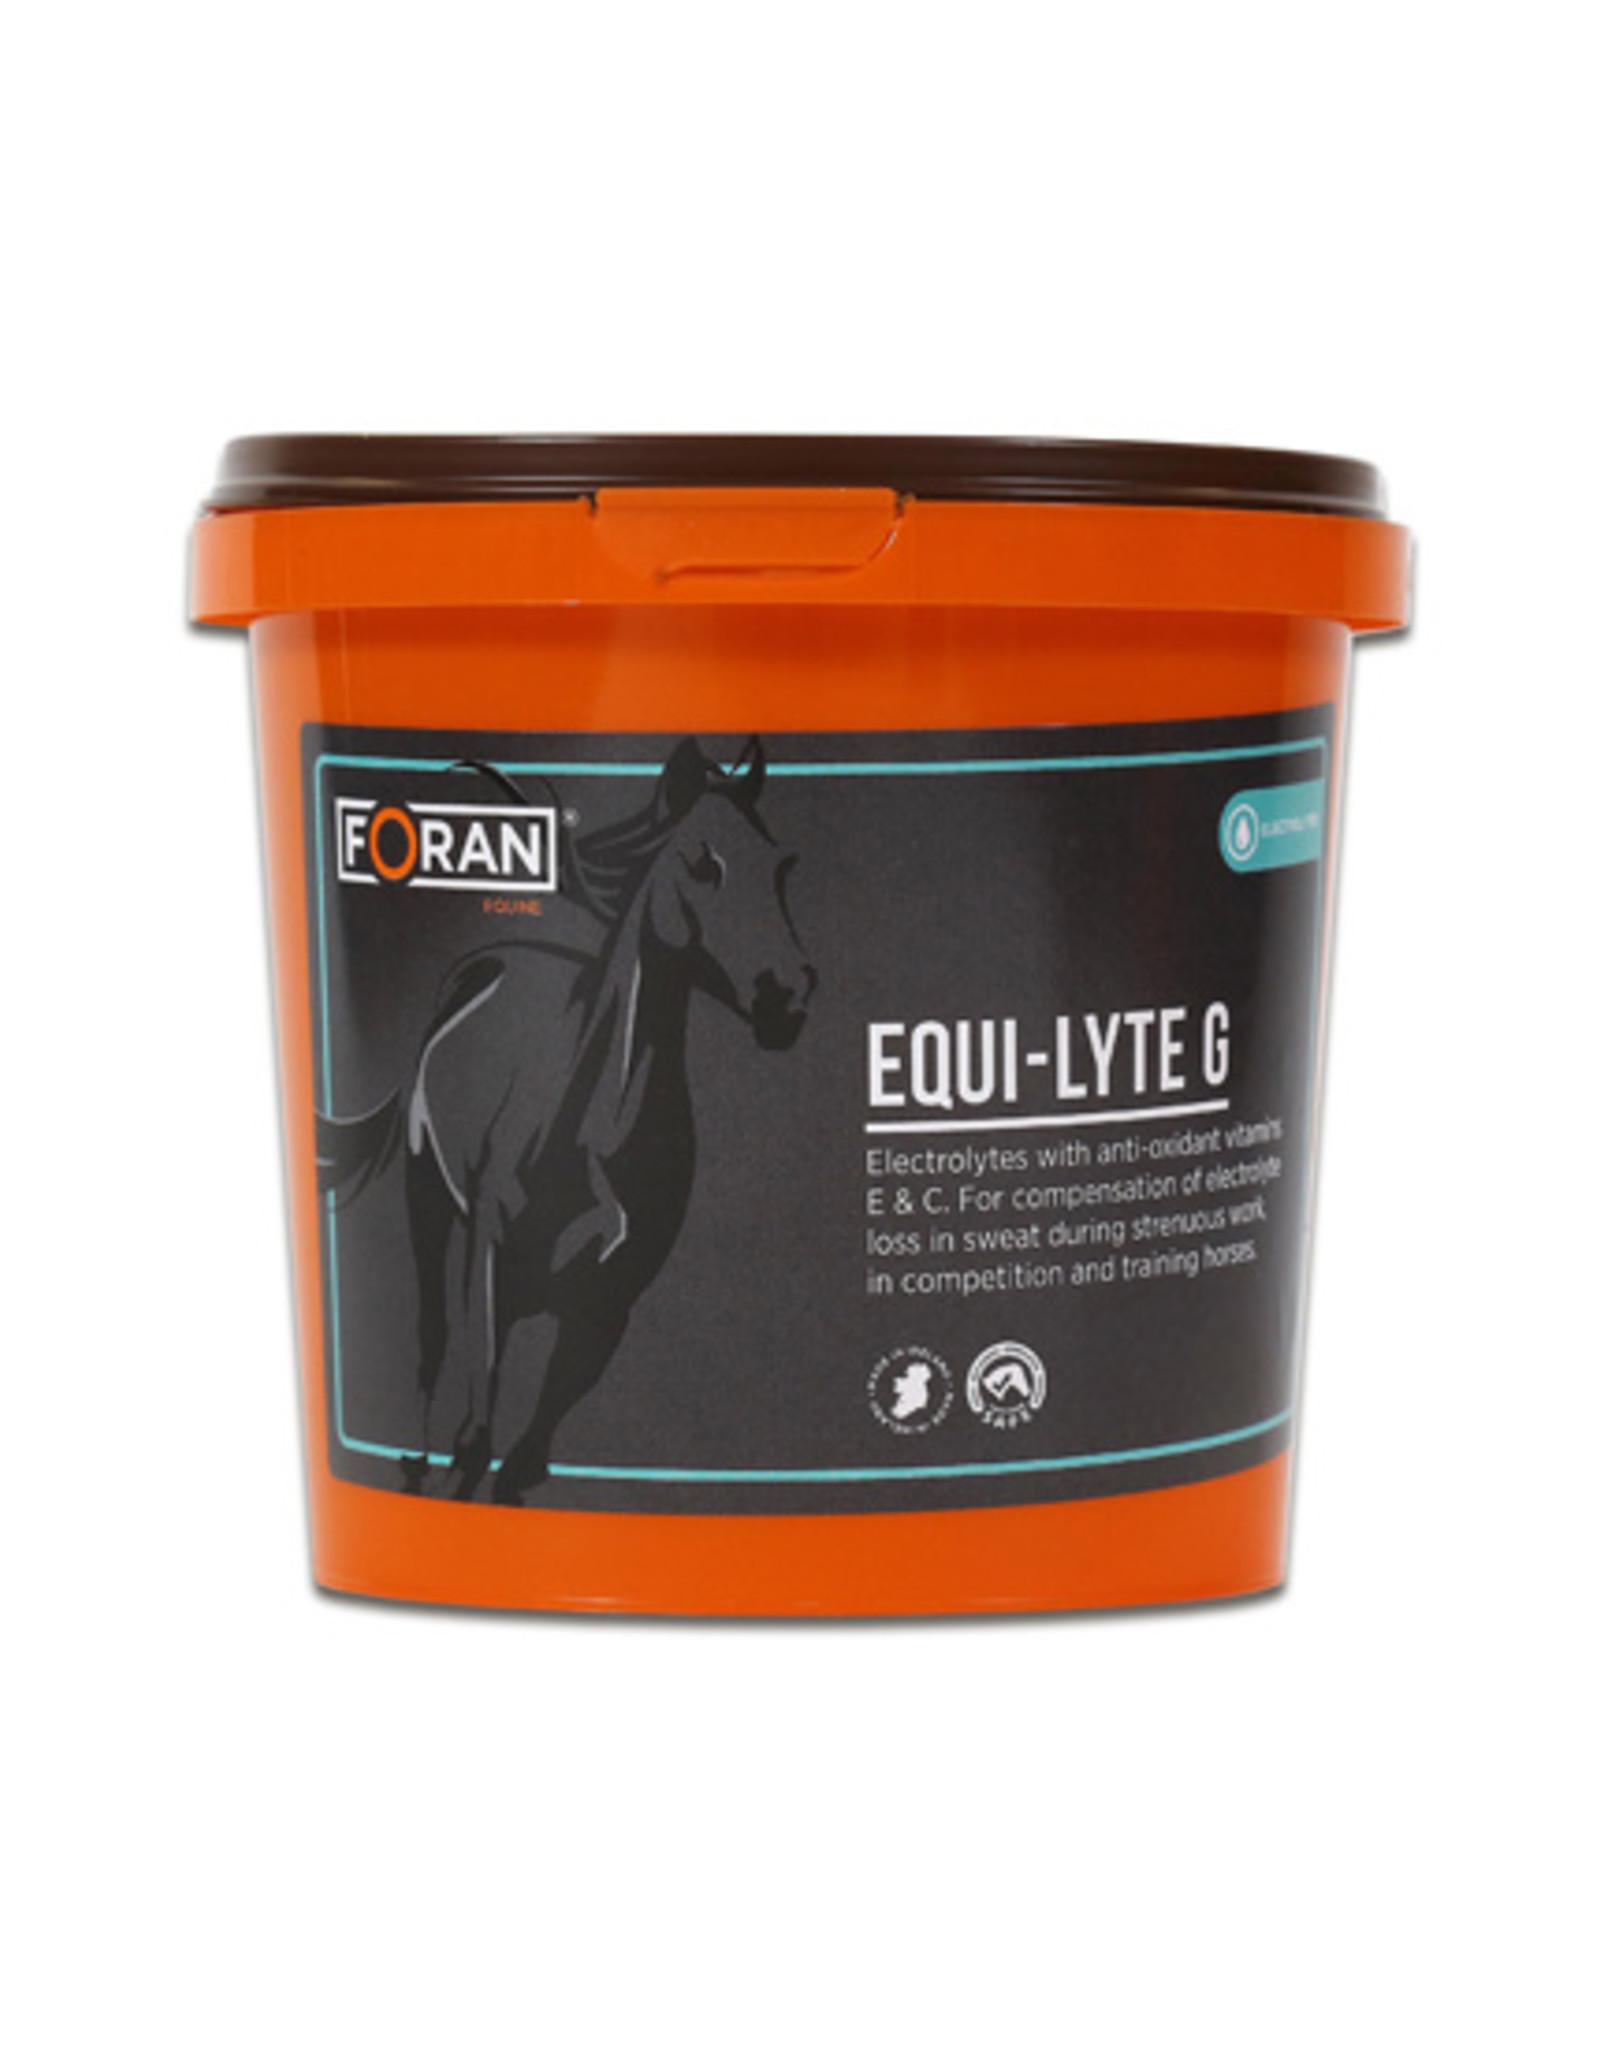 Foran Equi-Lyte G